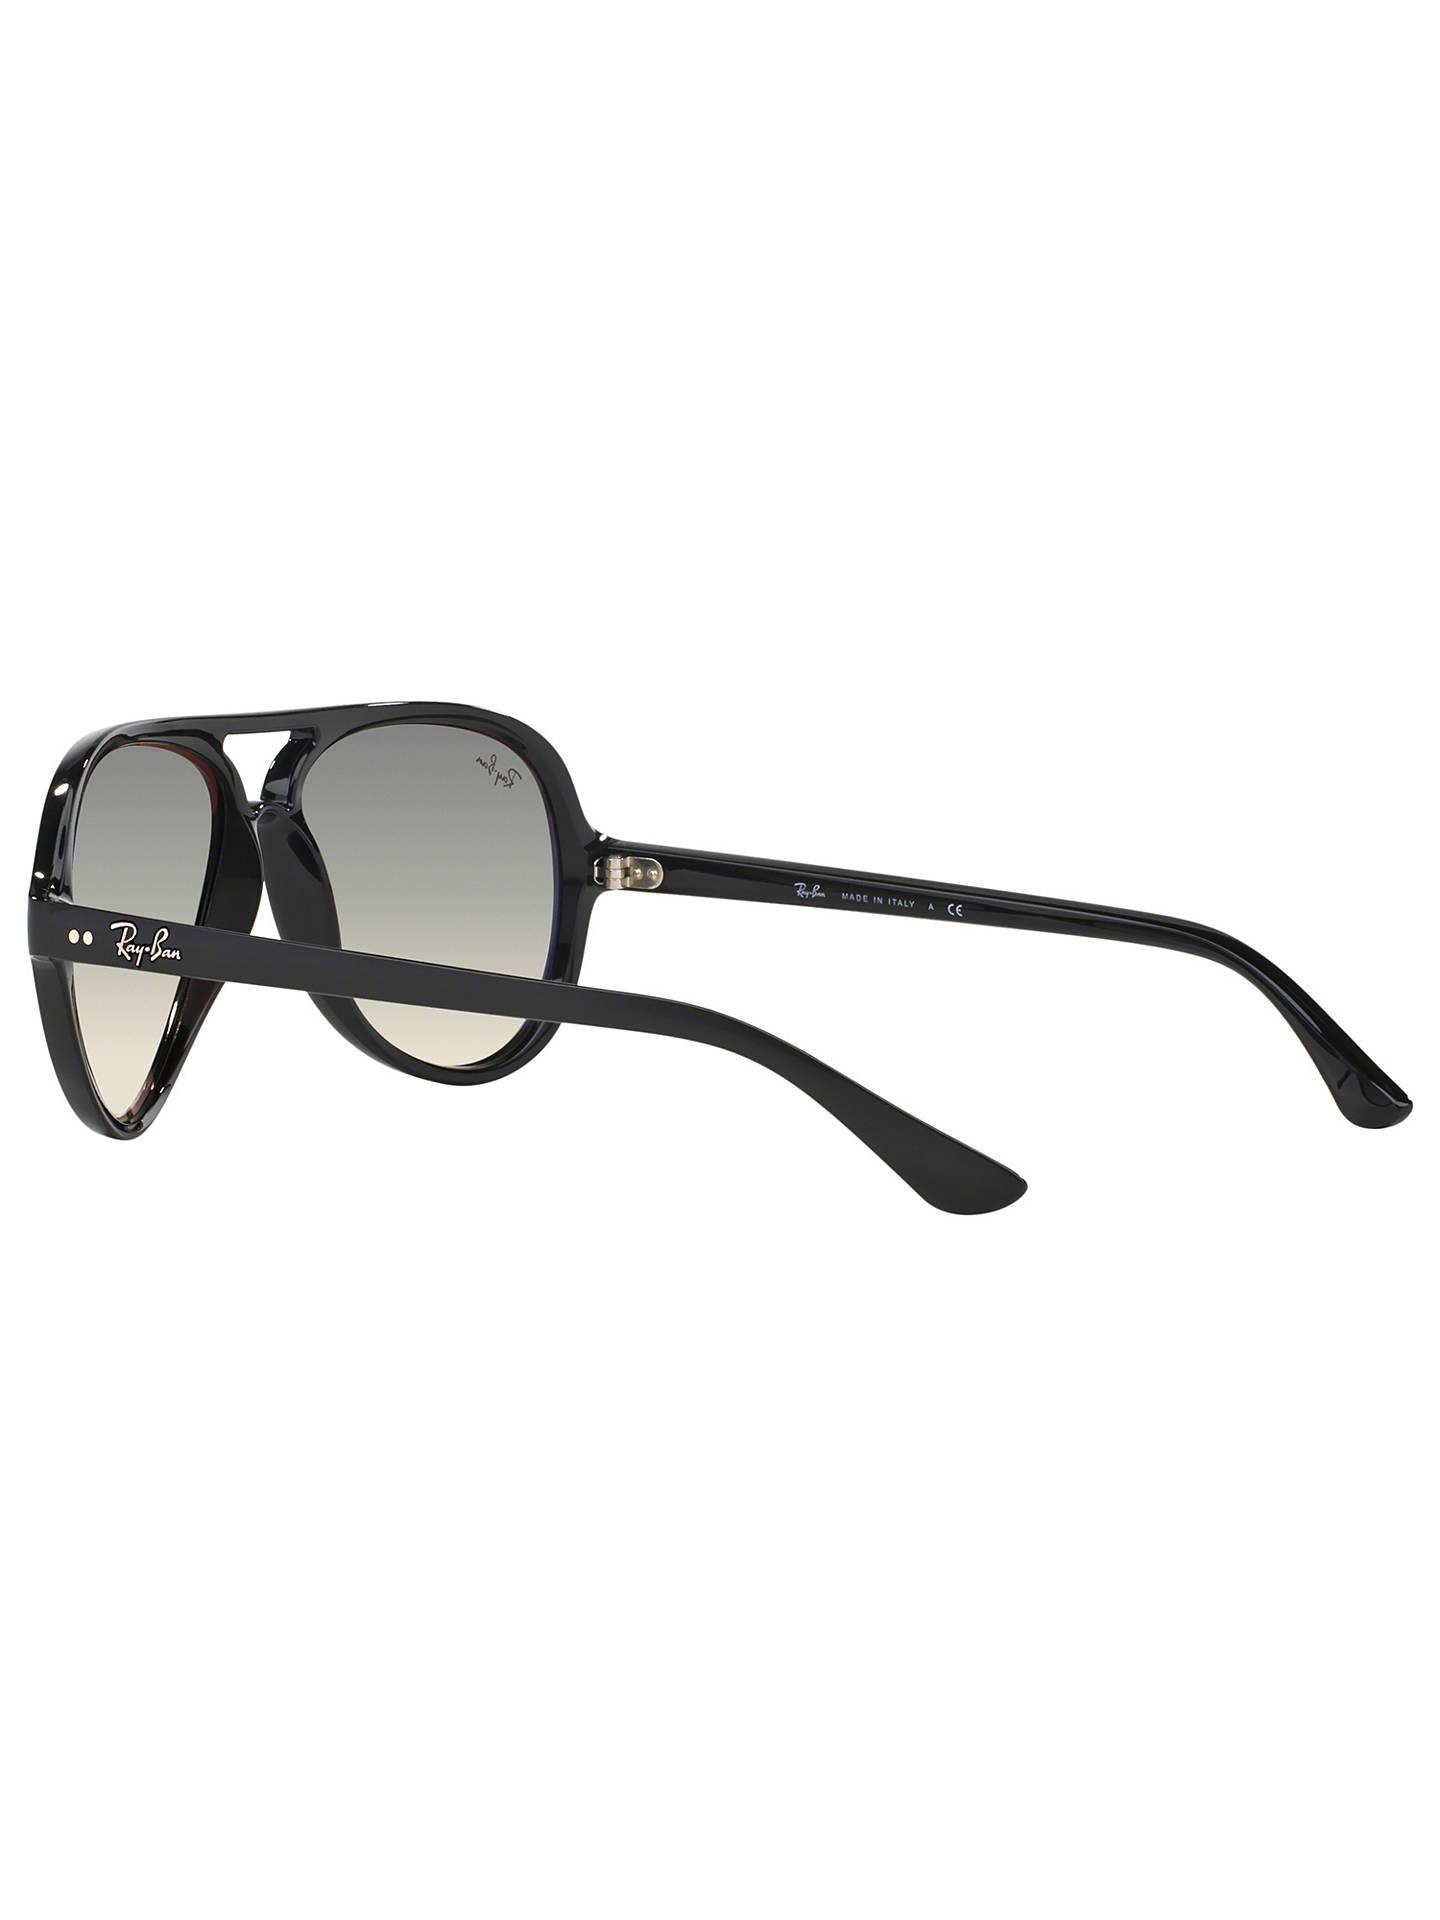 c4328f7de112a ... Buy Ray-Ban RB4125 Cats 5000 Aviator Sunglasses